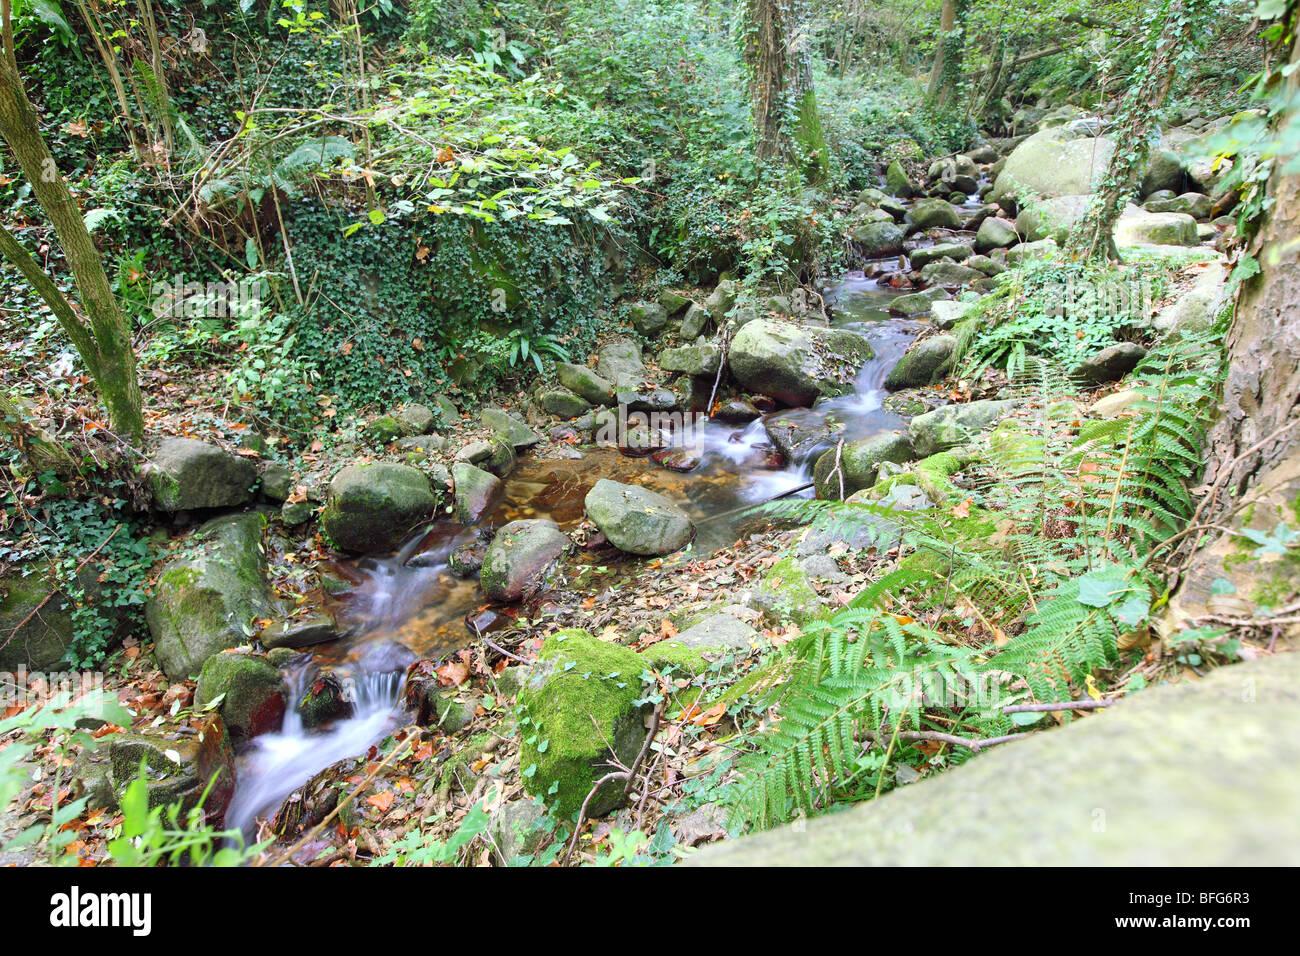 Spain, Cataluna, Catalonia, Catalunya, Costa Brava, hiking nature landscape mountains - Stock Image